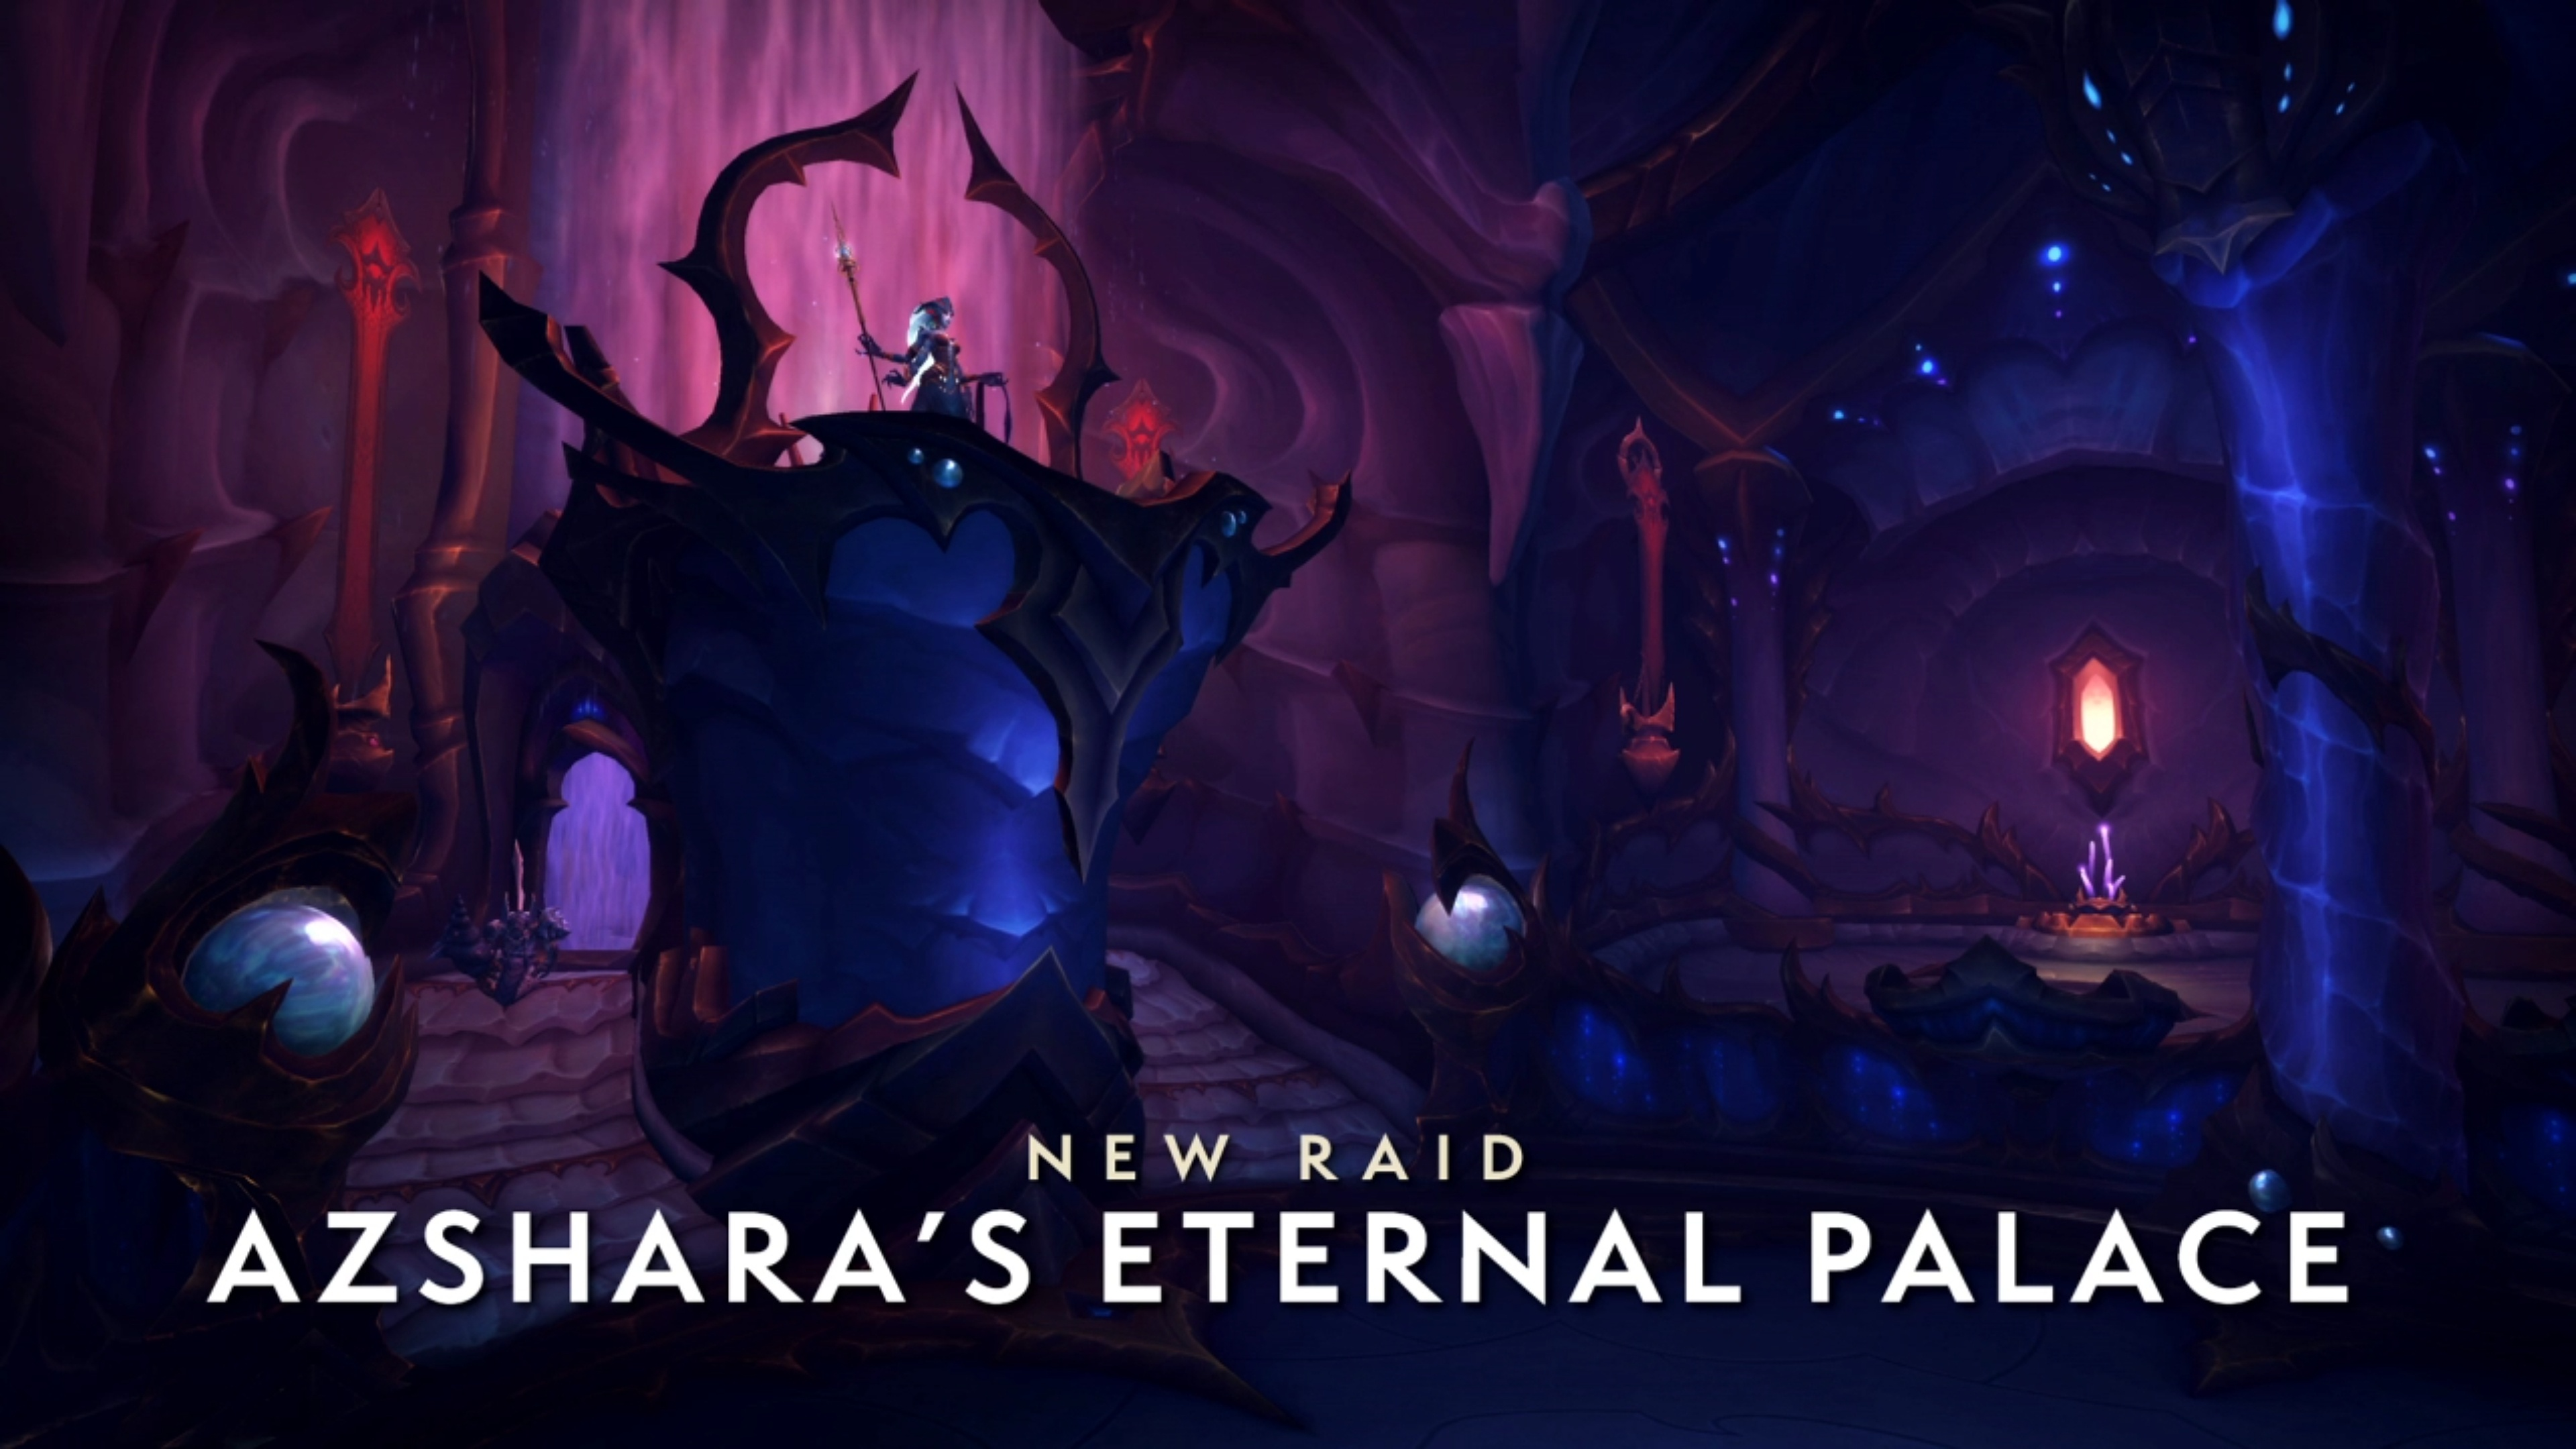 WTS Heroic Azshara's Eternal Palace Personal Loot Run. CHEAP&SAFE!